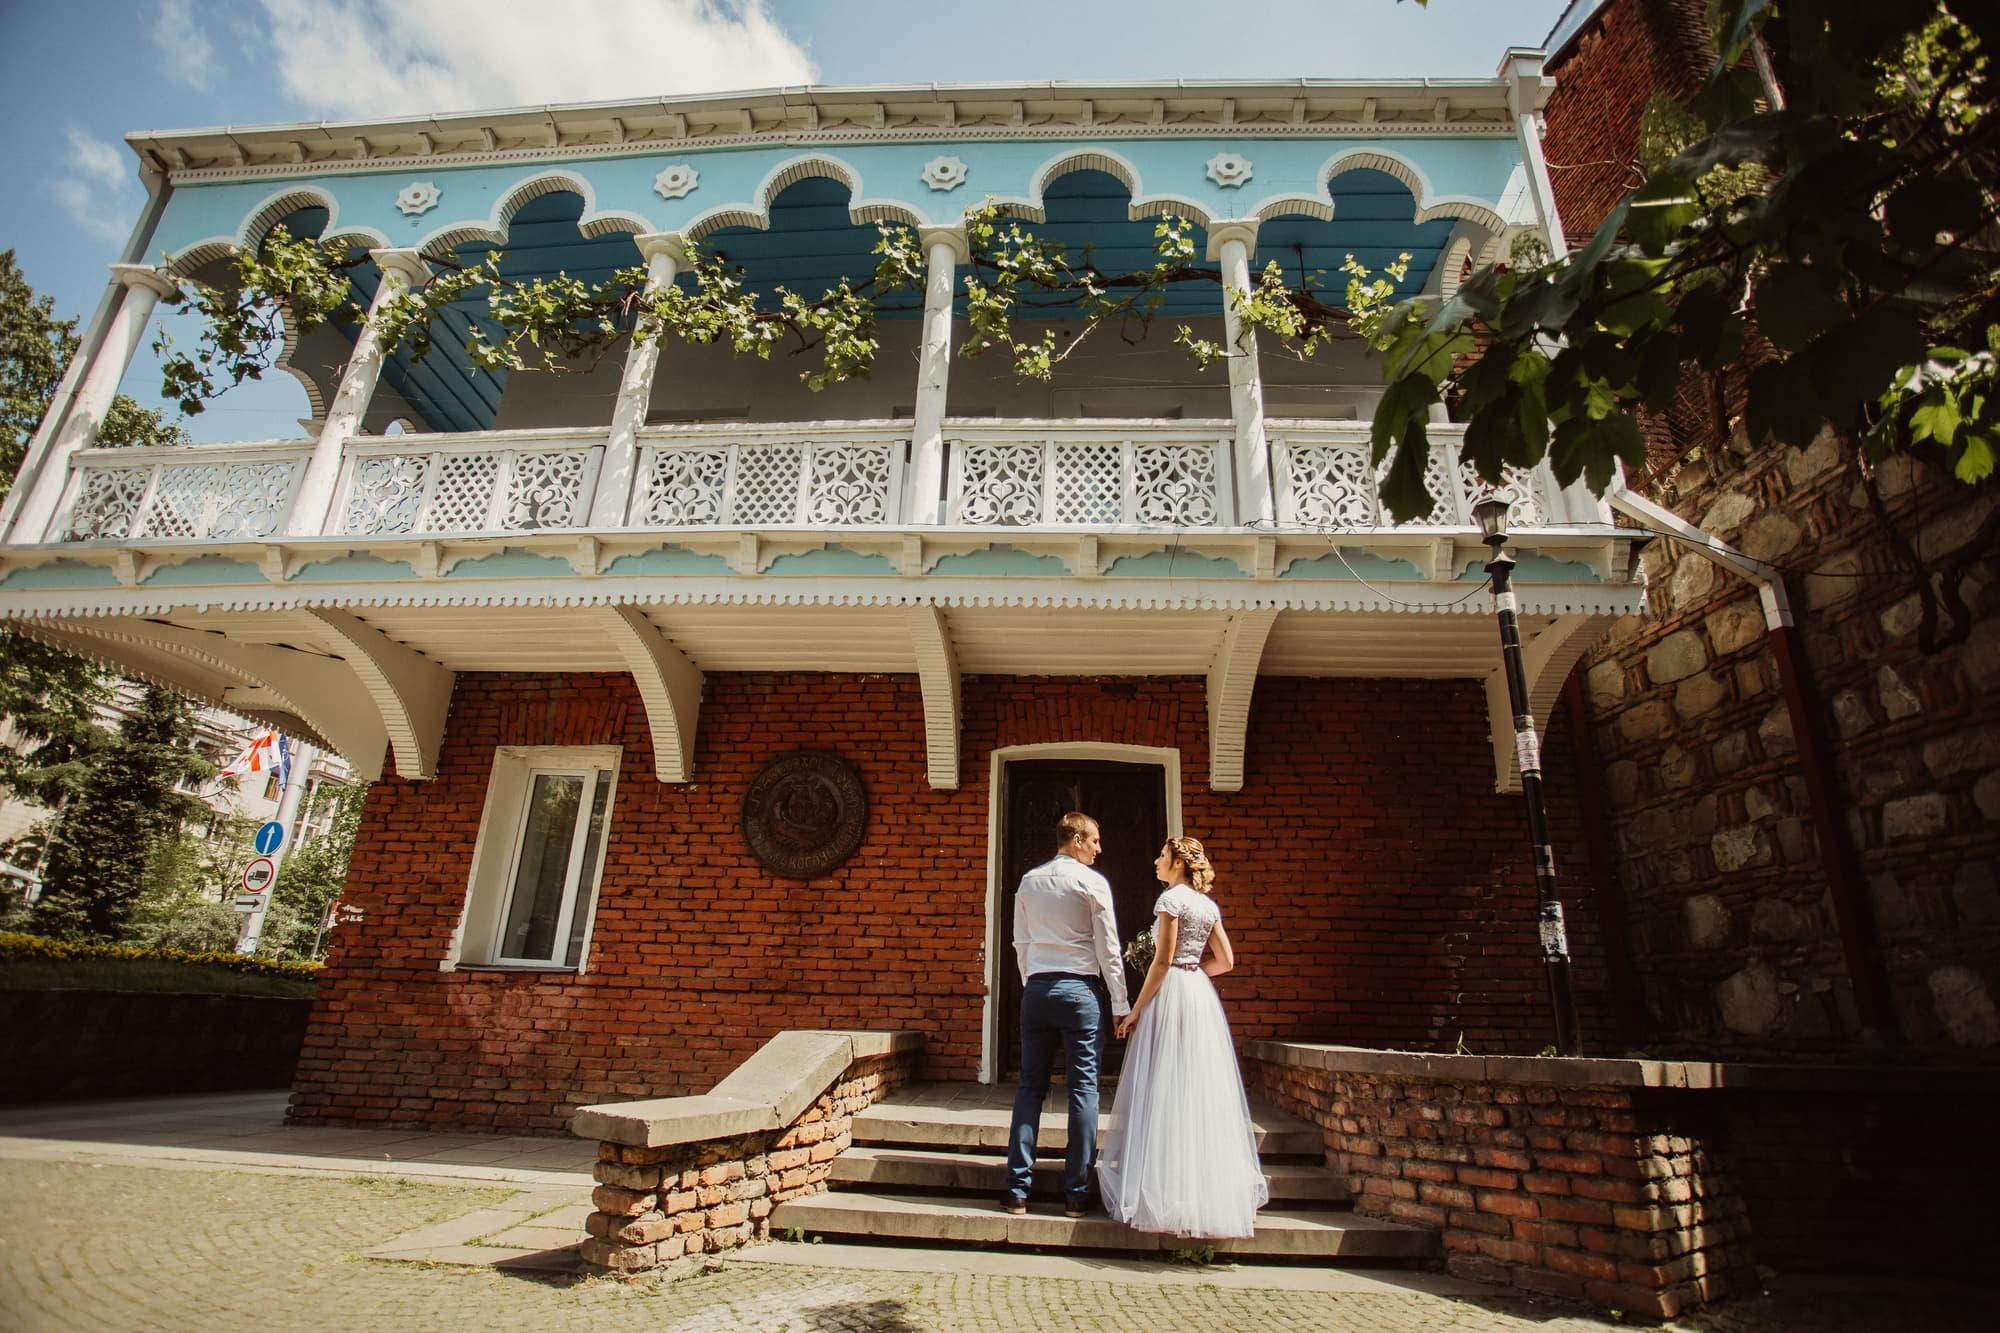 Пара в дворце бракосочетания